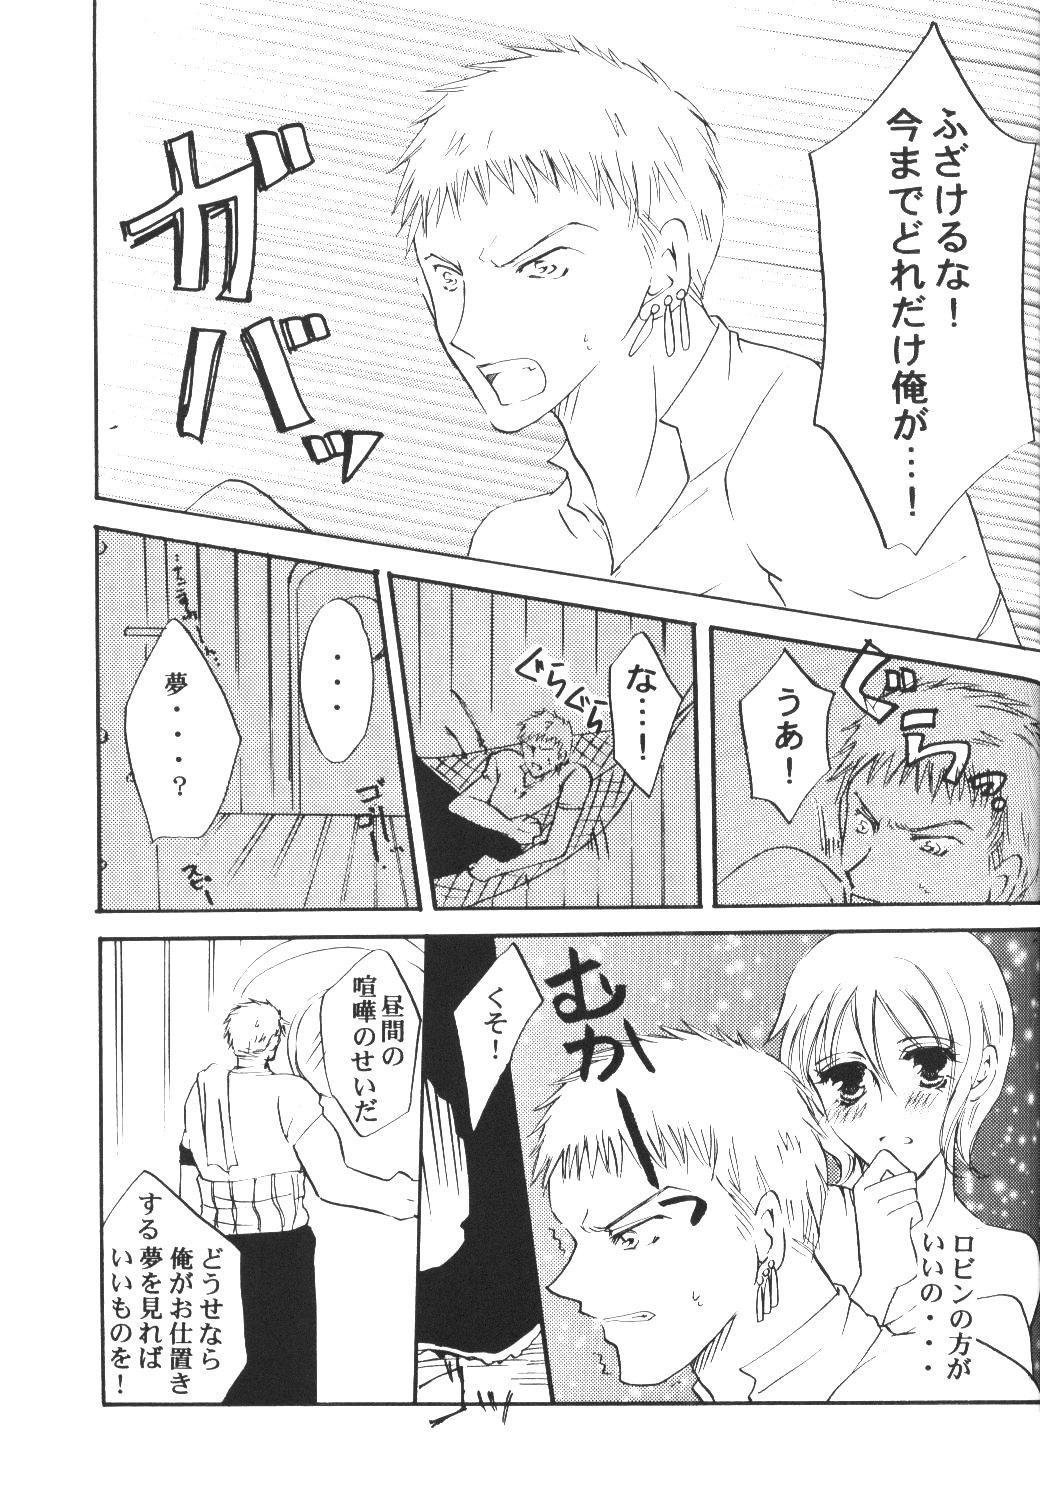 Yume Ichiya 2 143